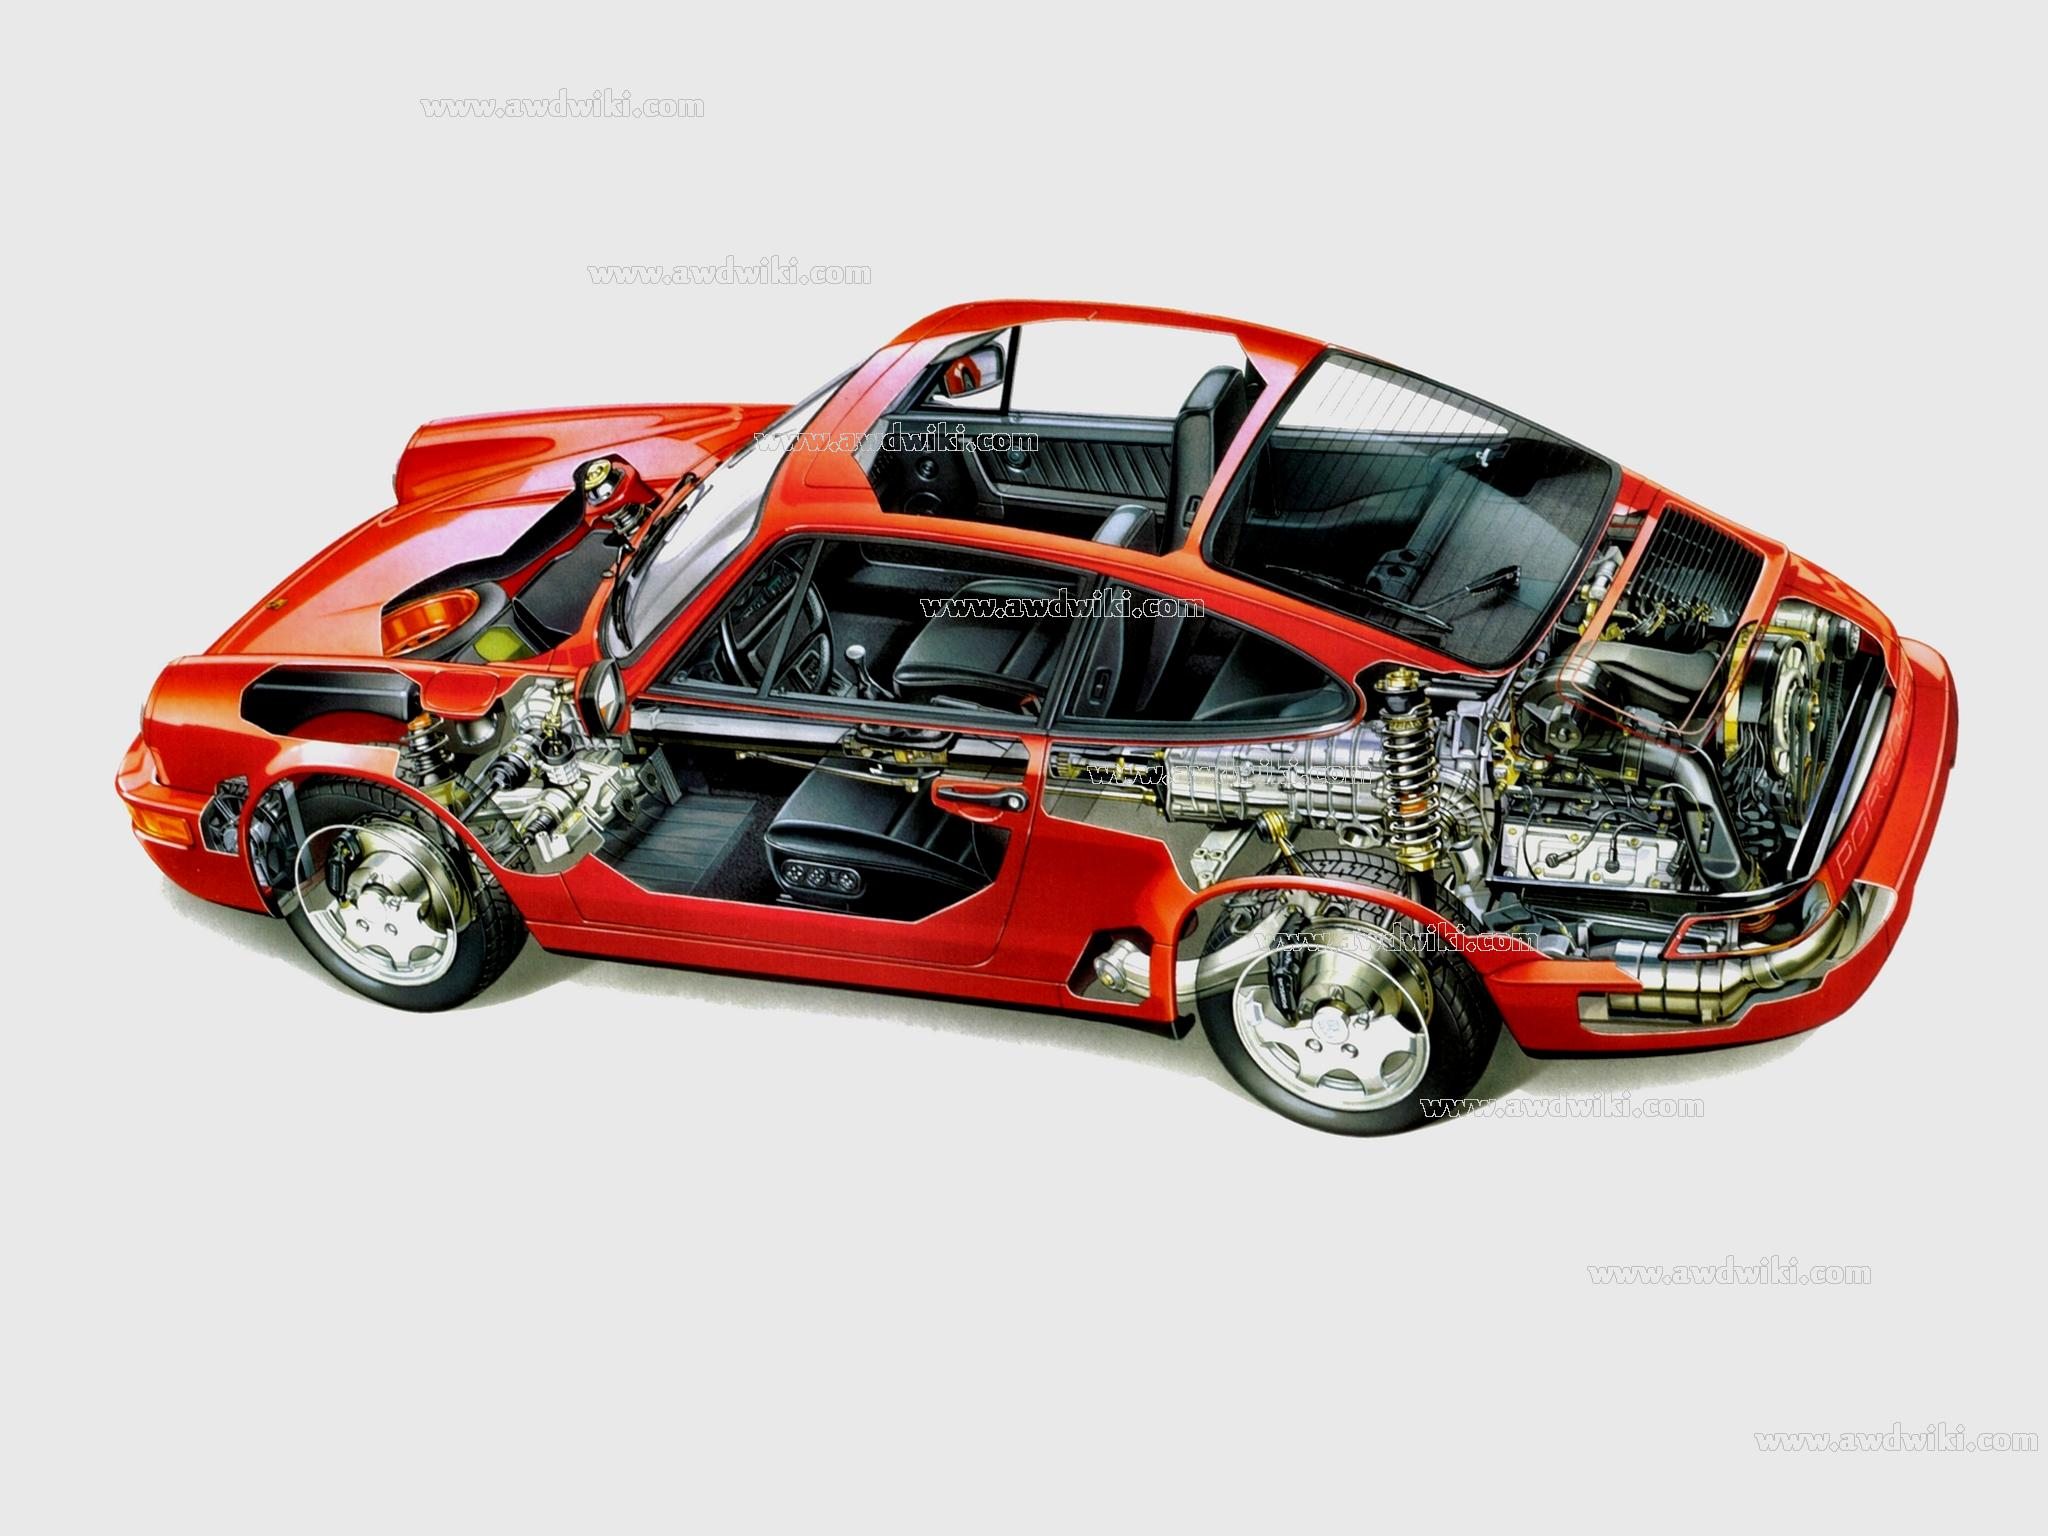 M porsche all wheel drive explained awd cars 4x4 vehicles 4wd trucks 4motion quattro